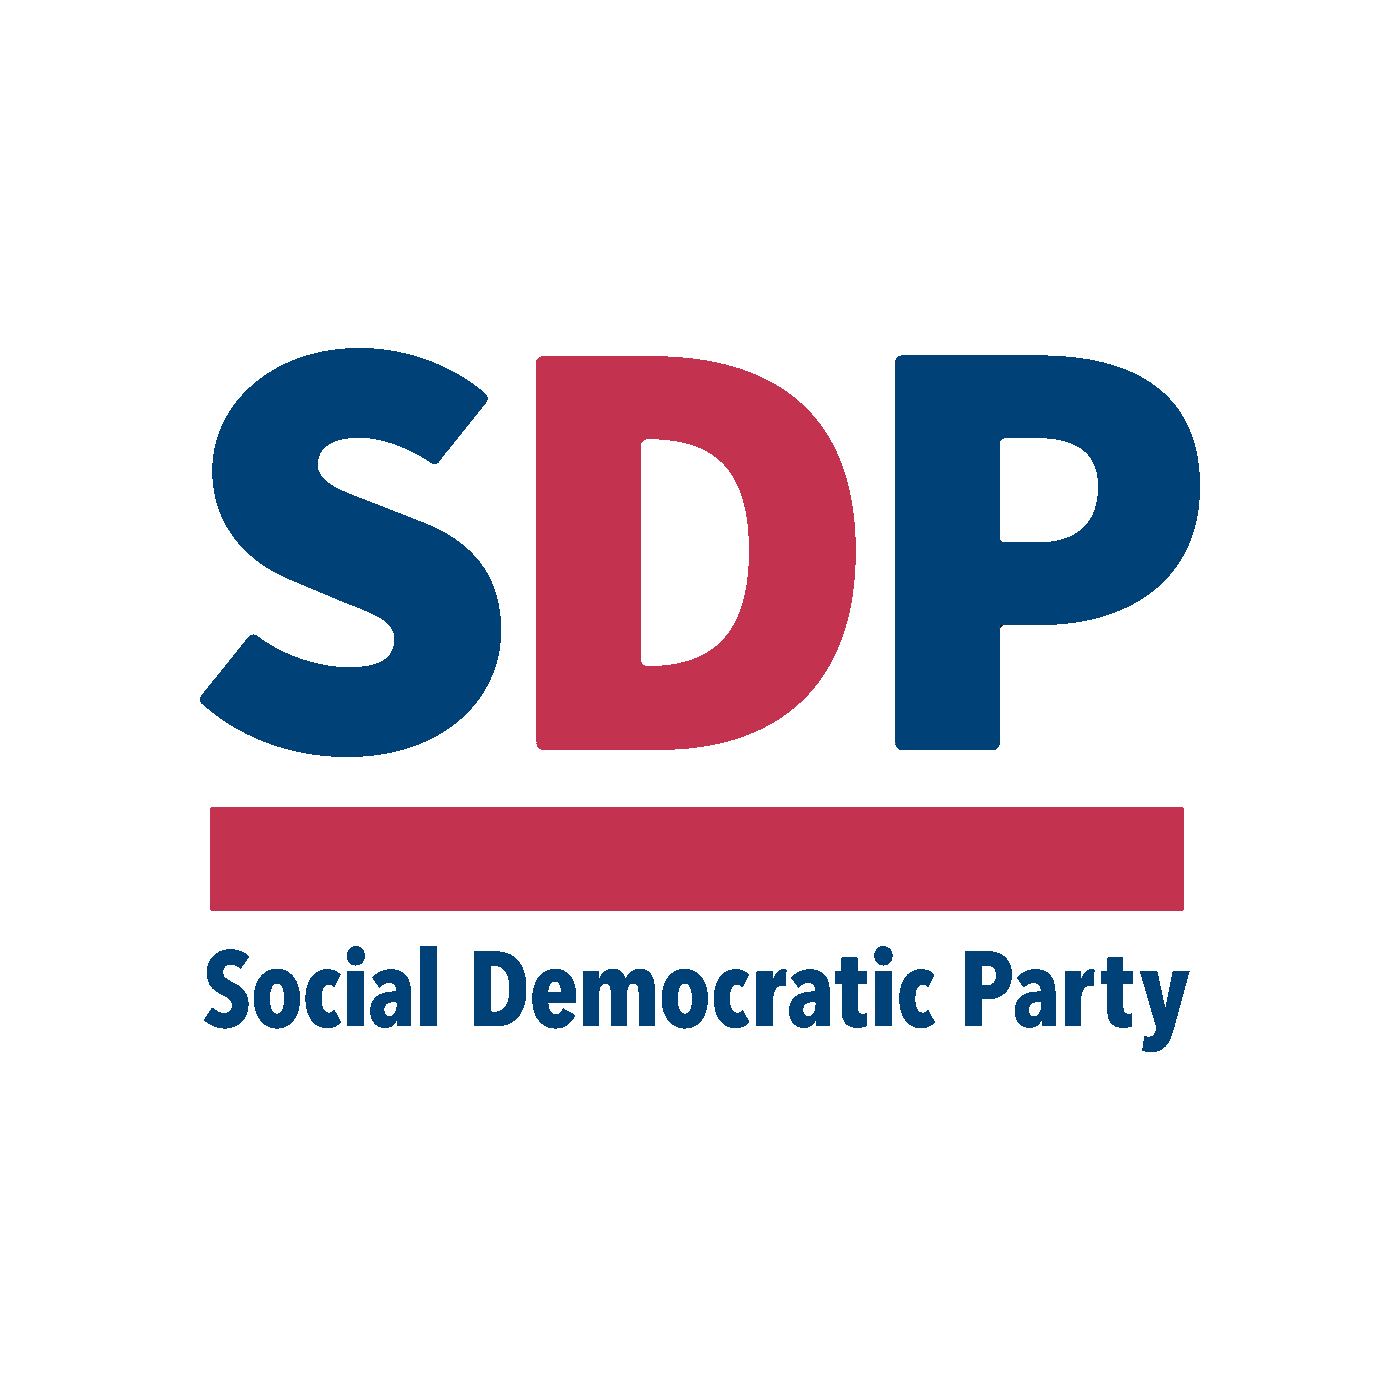 SDP - The Social Democratic Party